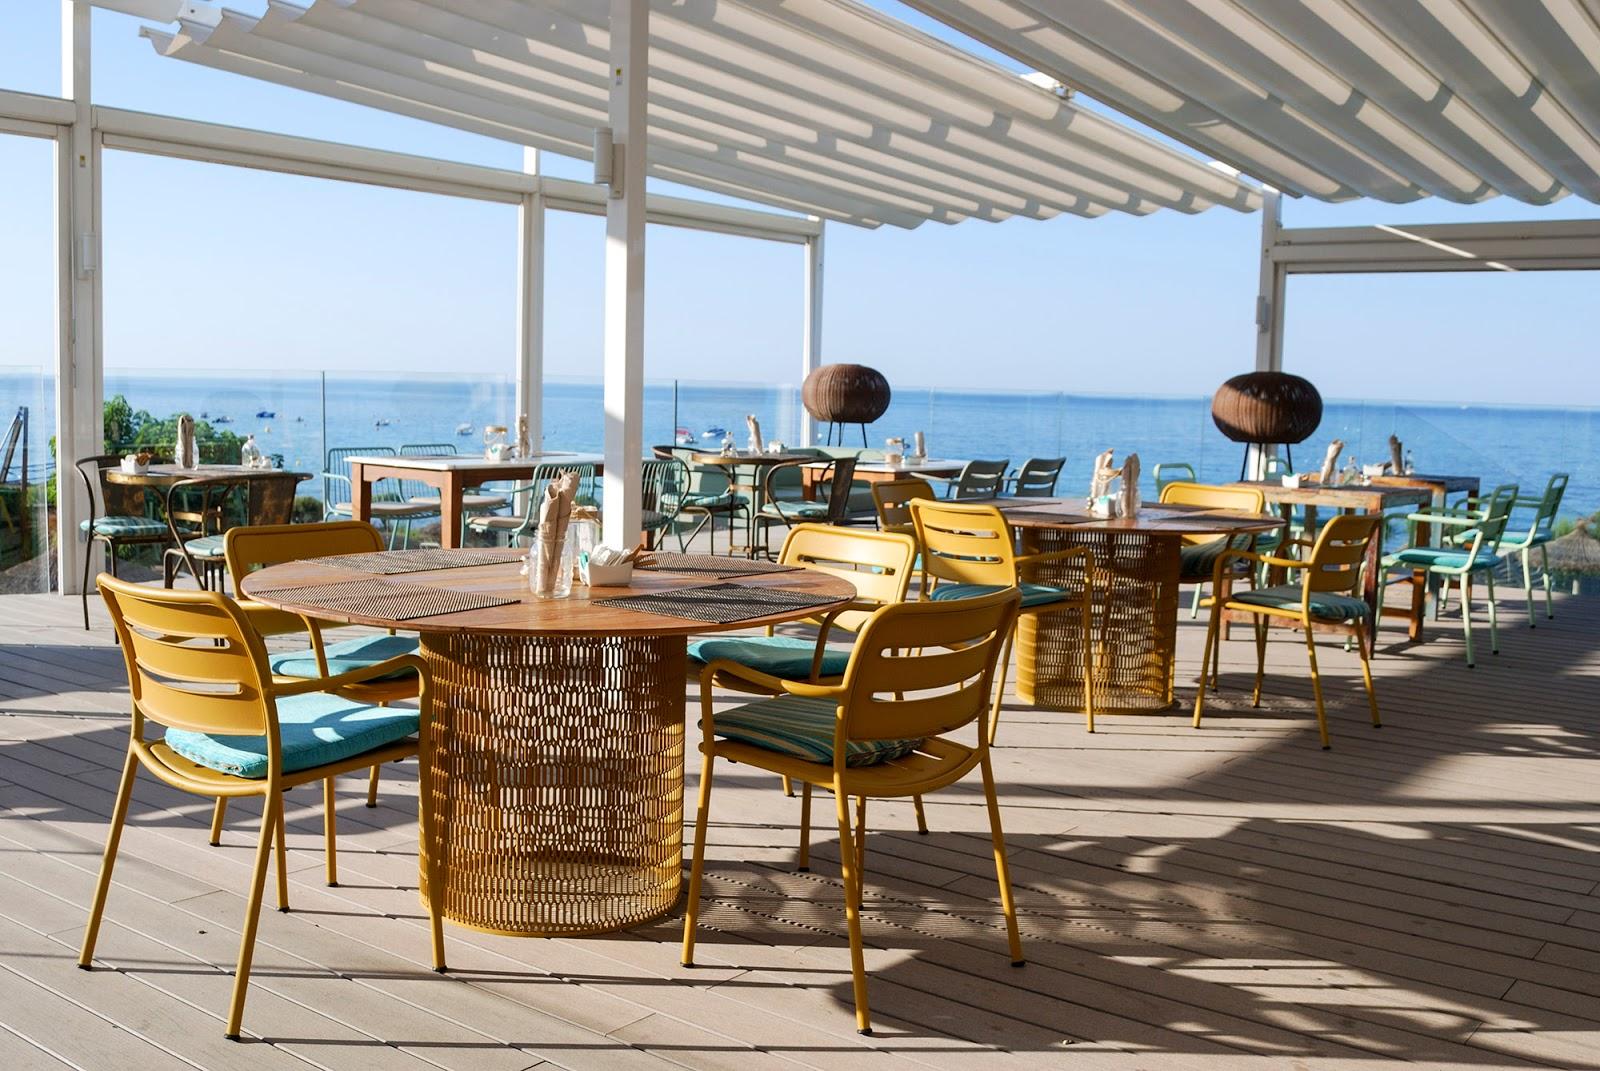 Sol Beach House Menorca Spain Melia Hotel sea view